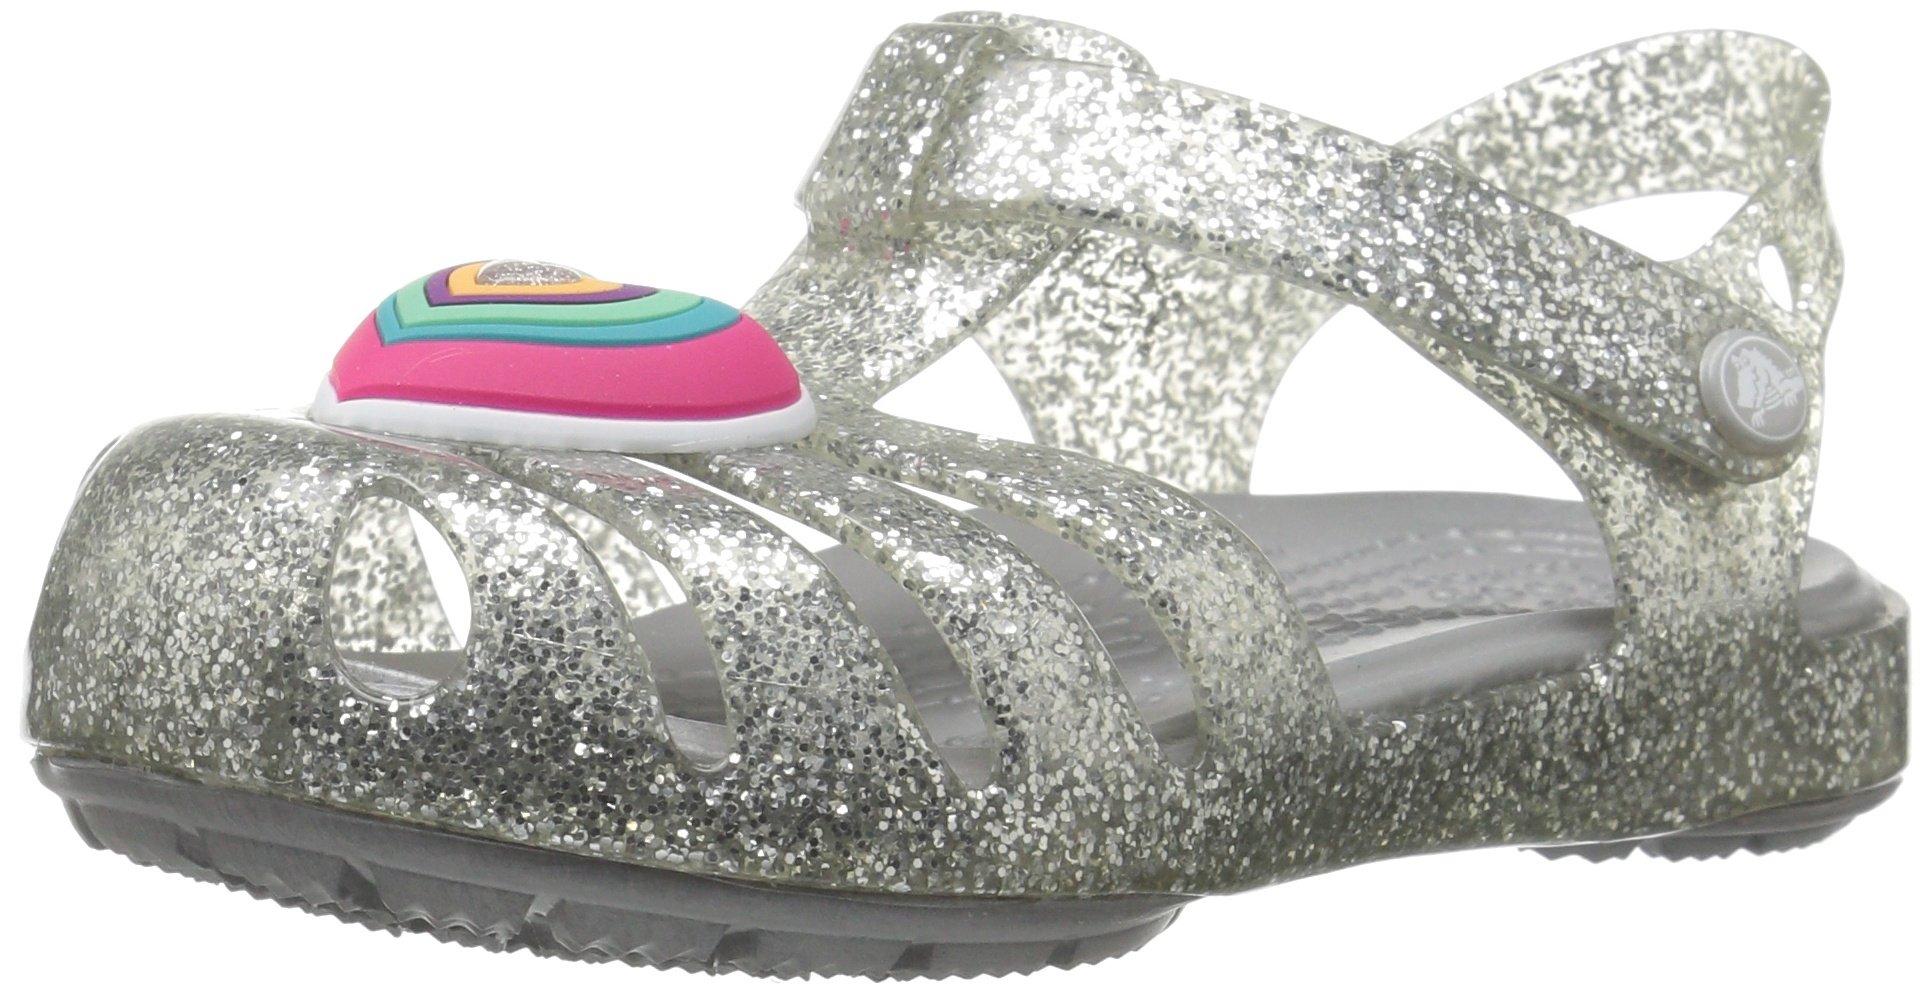 Crocs Girls' Isabella Novelty Flat Sandal, Silver, 11 M US Little Kid